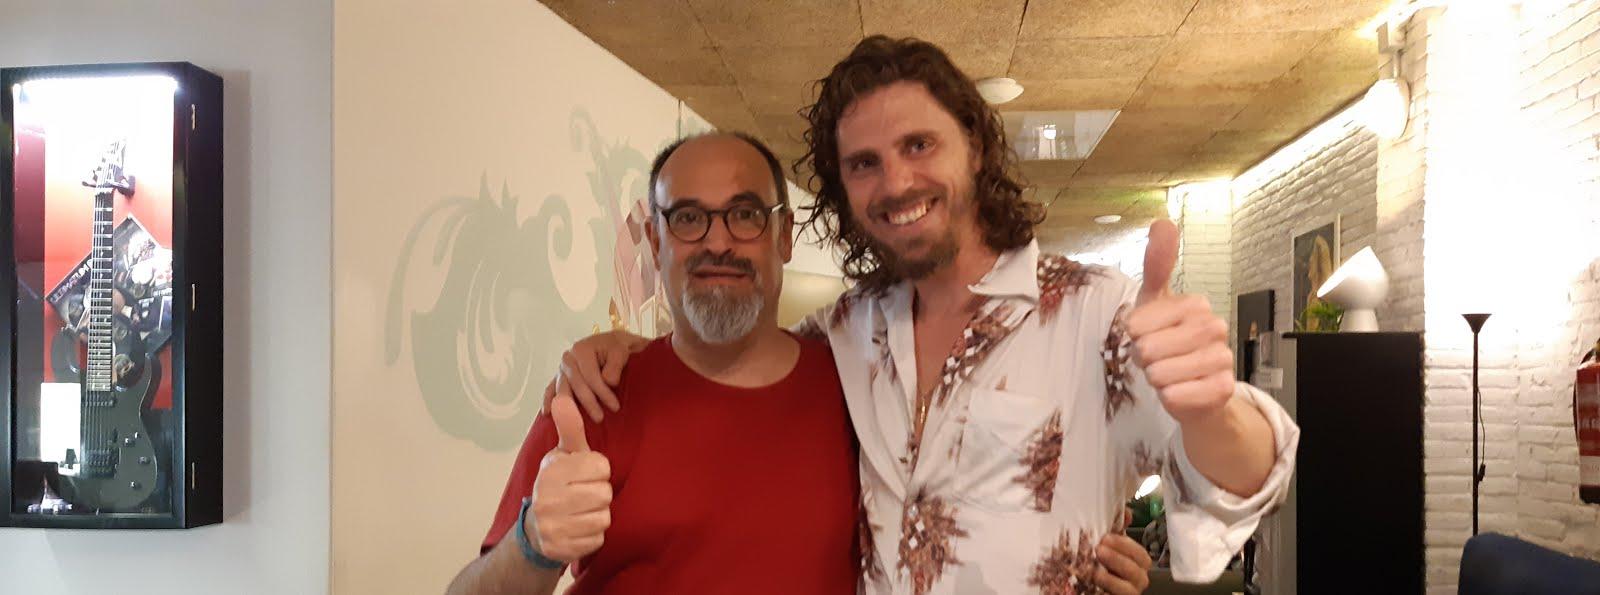 Amb Sergi Blanch